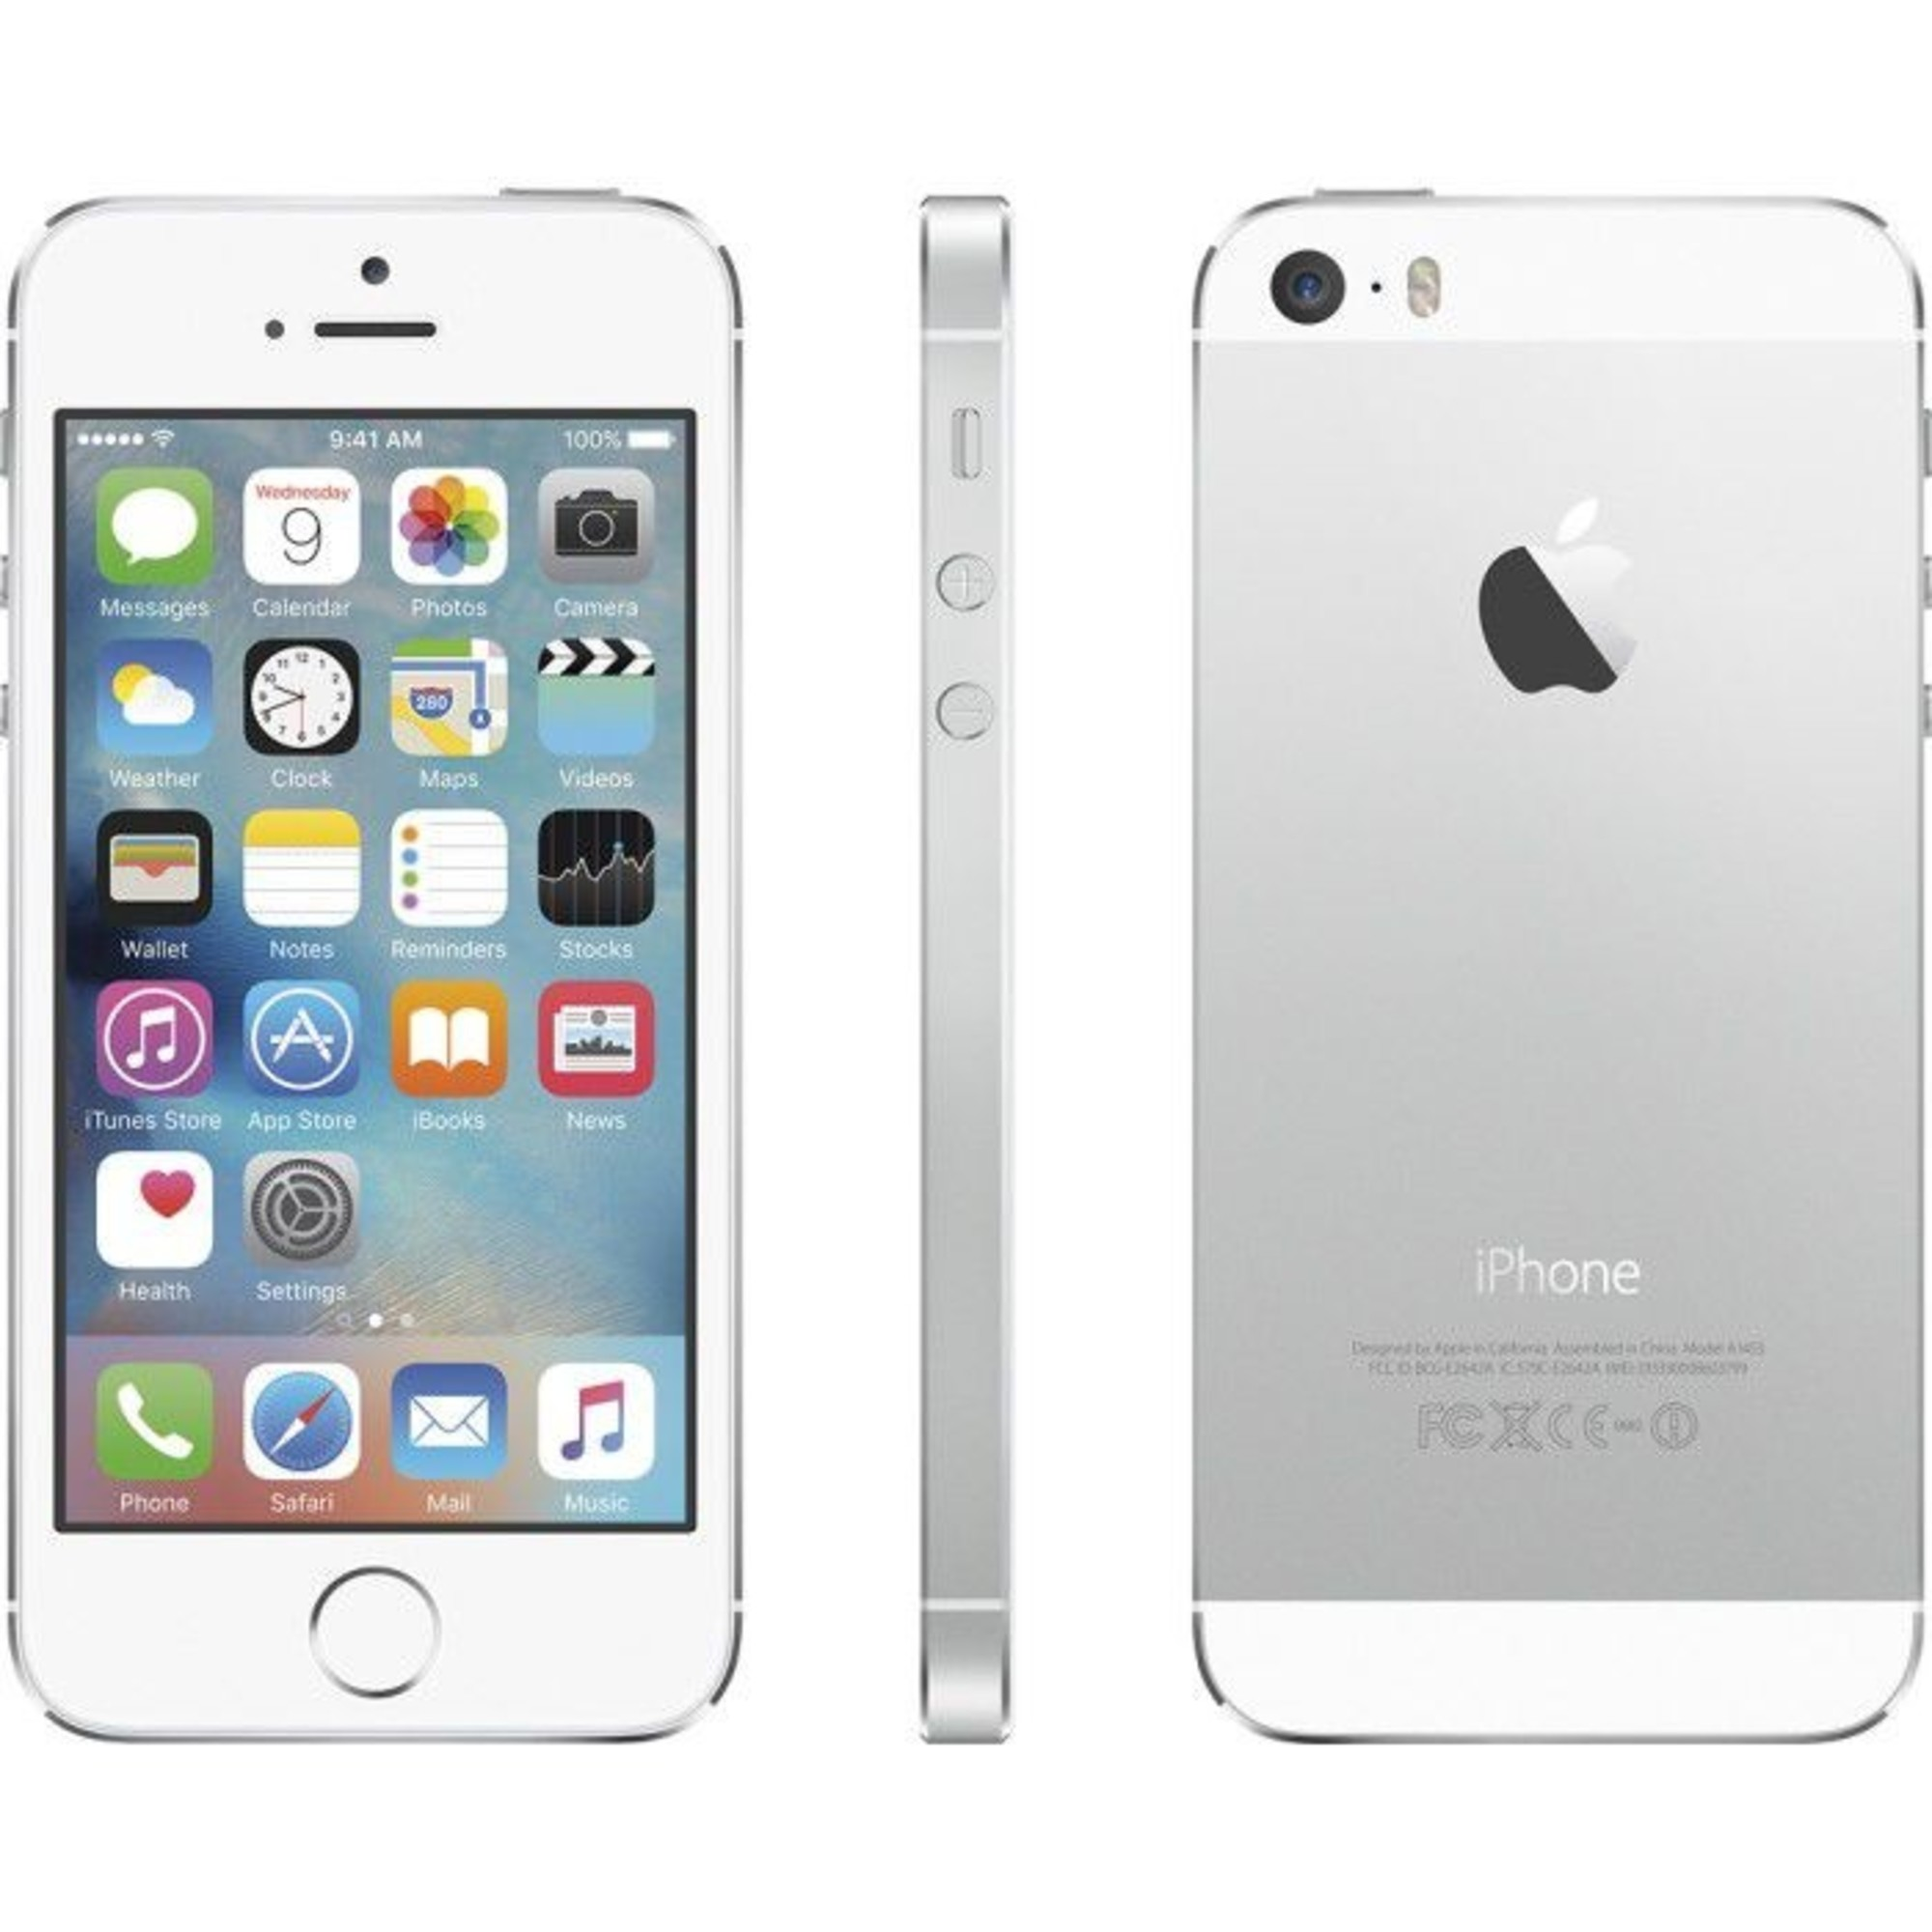 apple iphone 5s 16gb unlocked gsm lte dualcore 8mp phone. Black Bedroom Furniture Sets. Home Design Ideas